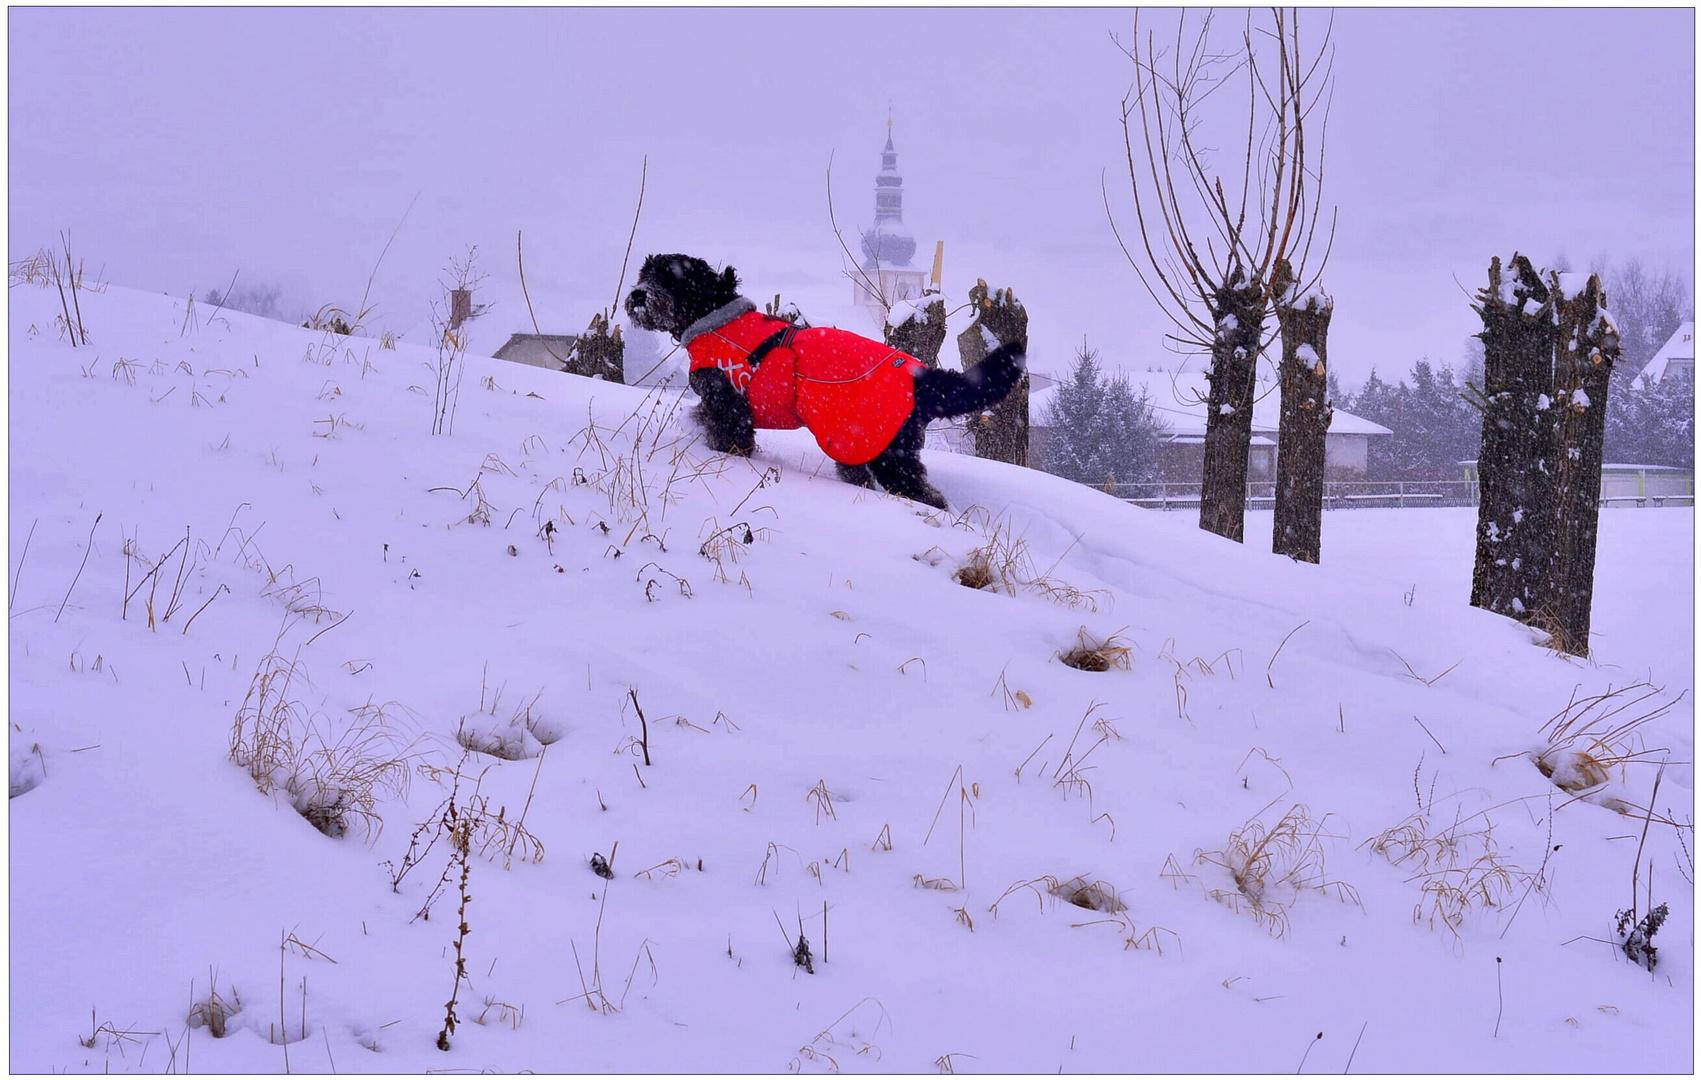 A Wicky-Emily le encanta la mucha nieve (Wicky-Emily ist vom vielen Schnee begeistert)